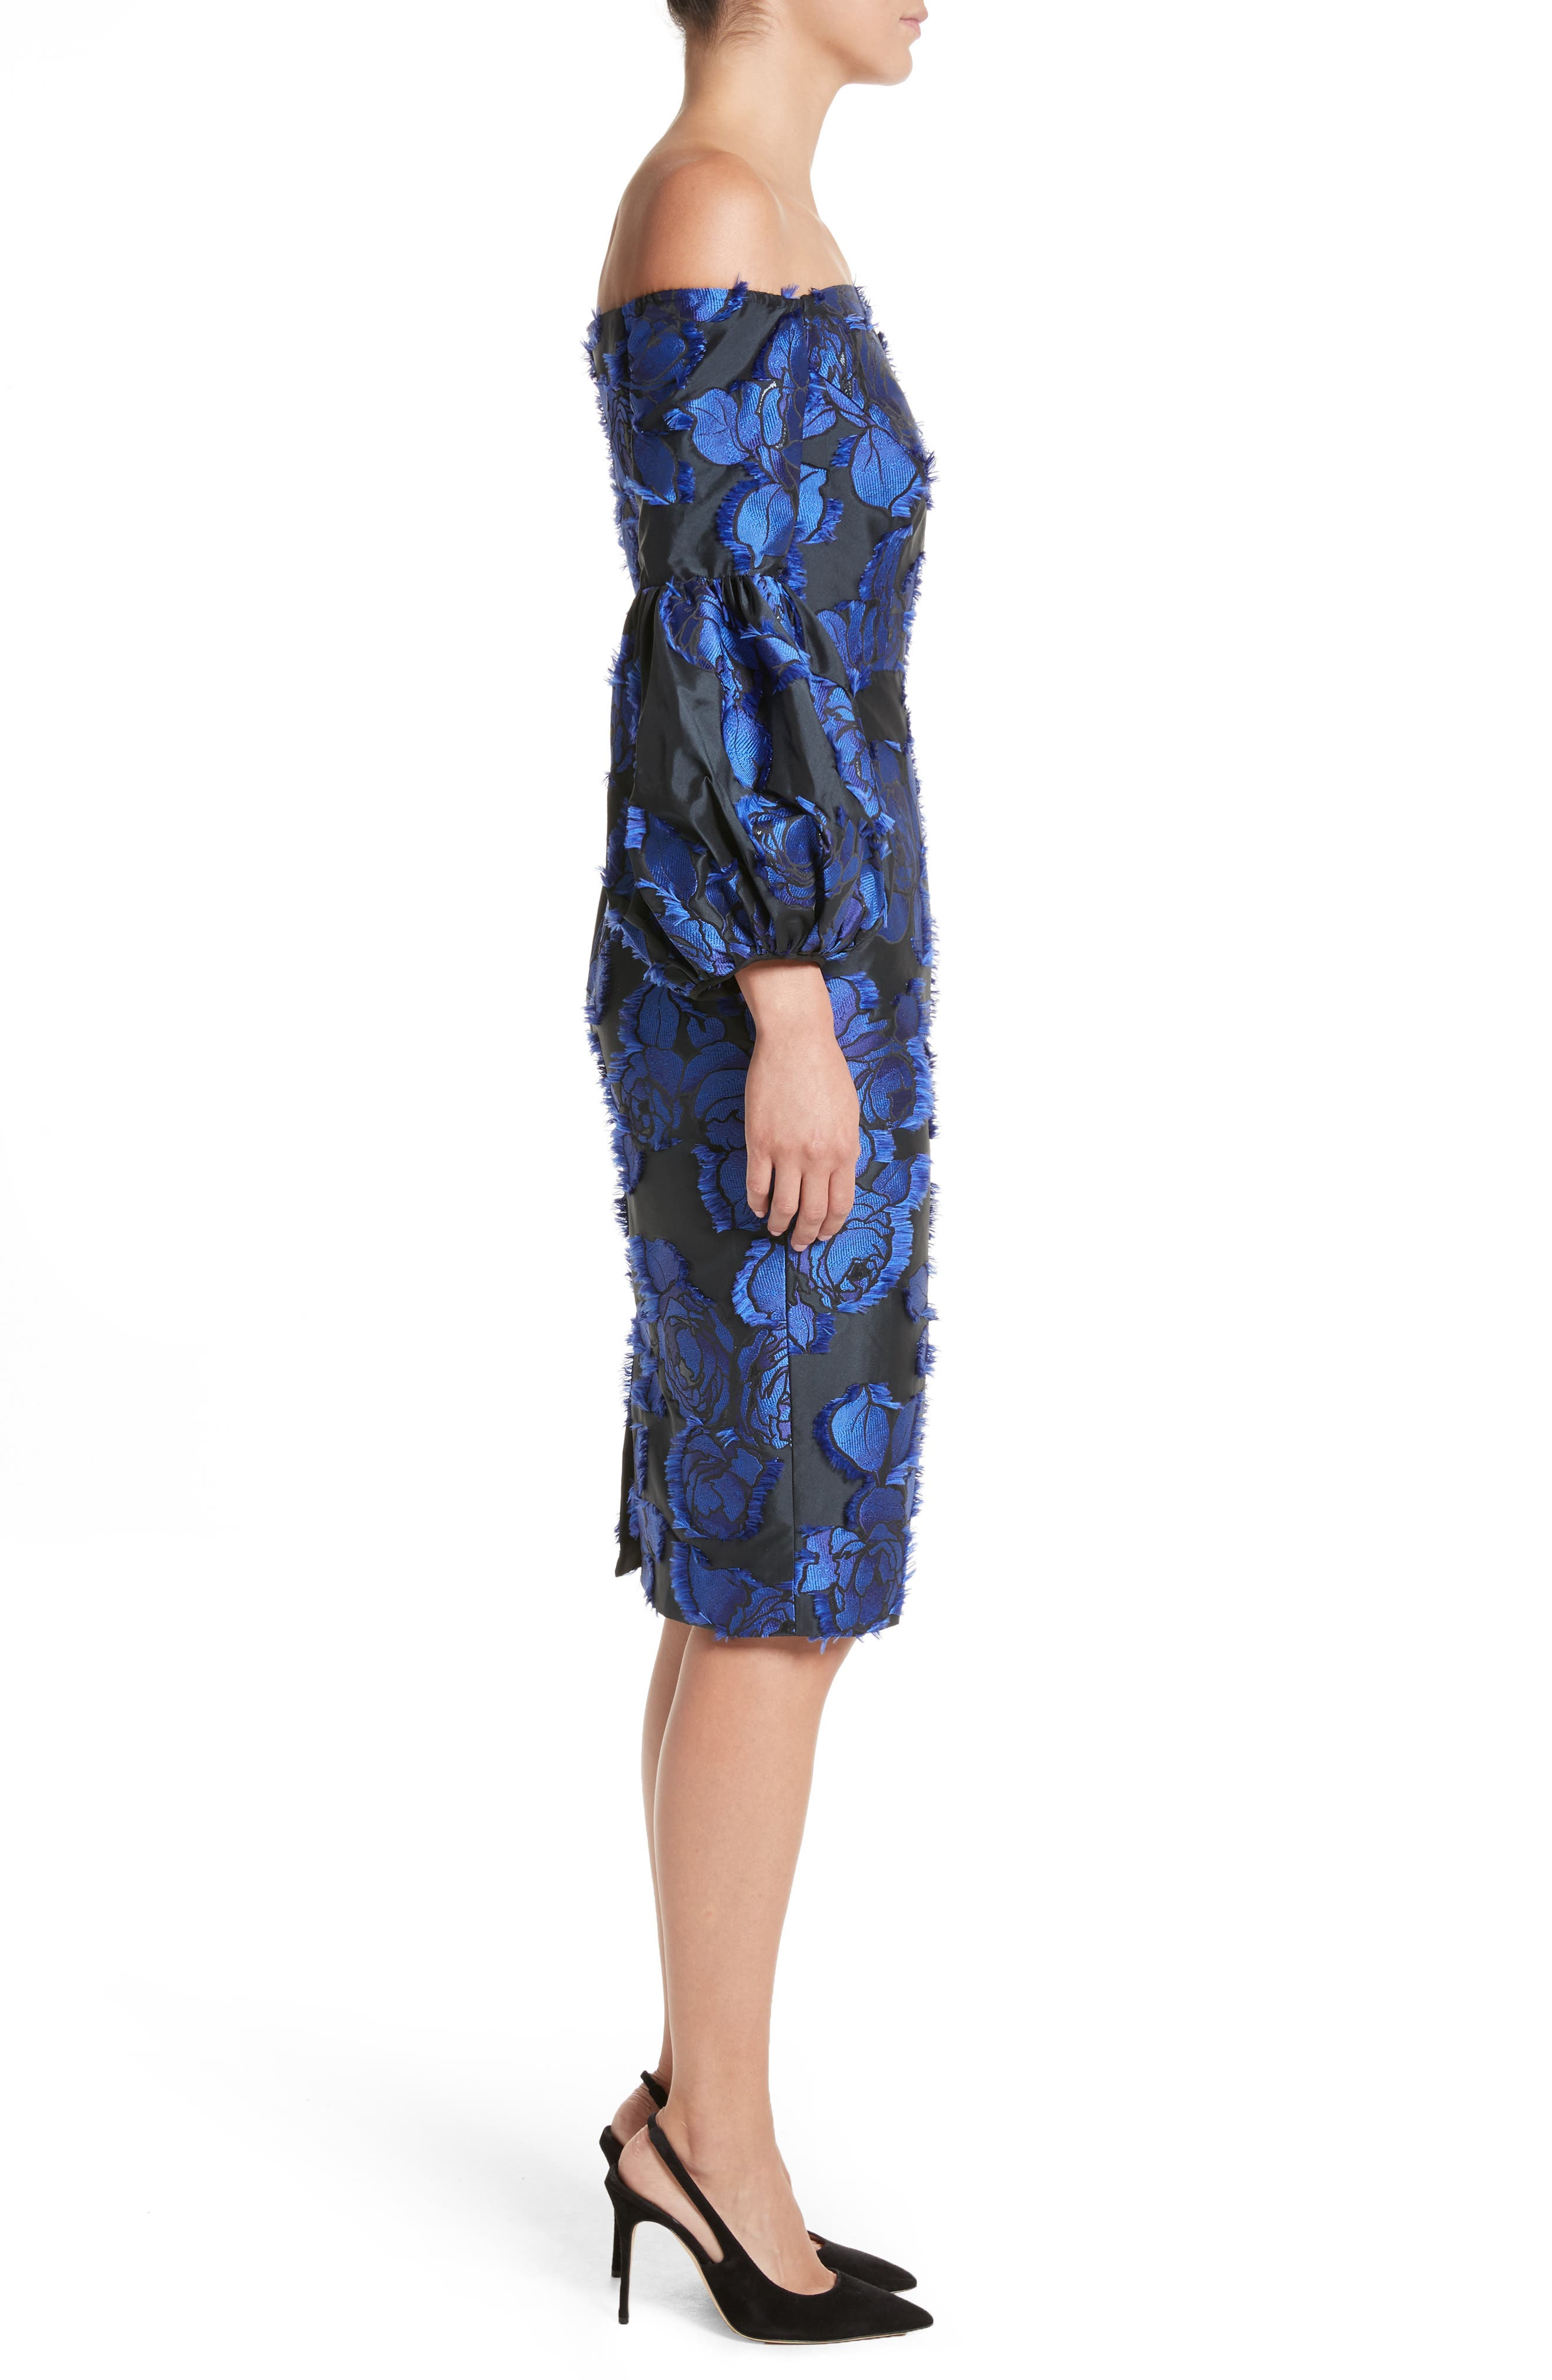 Fring Brocade Puff Sleeve Dress,                             Alternate thumbnail 6, color,                             Black/ Lapis